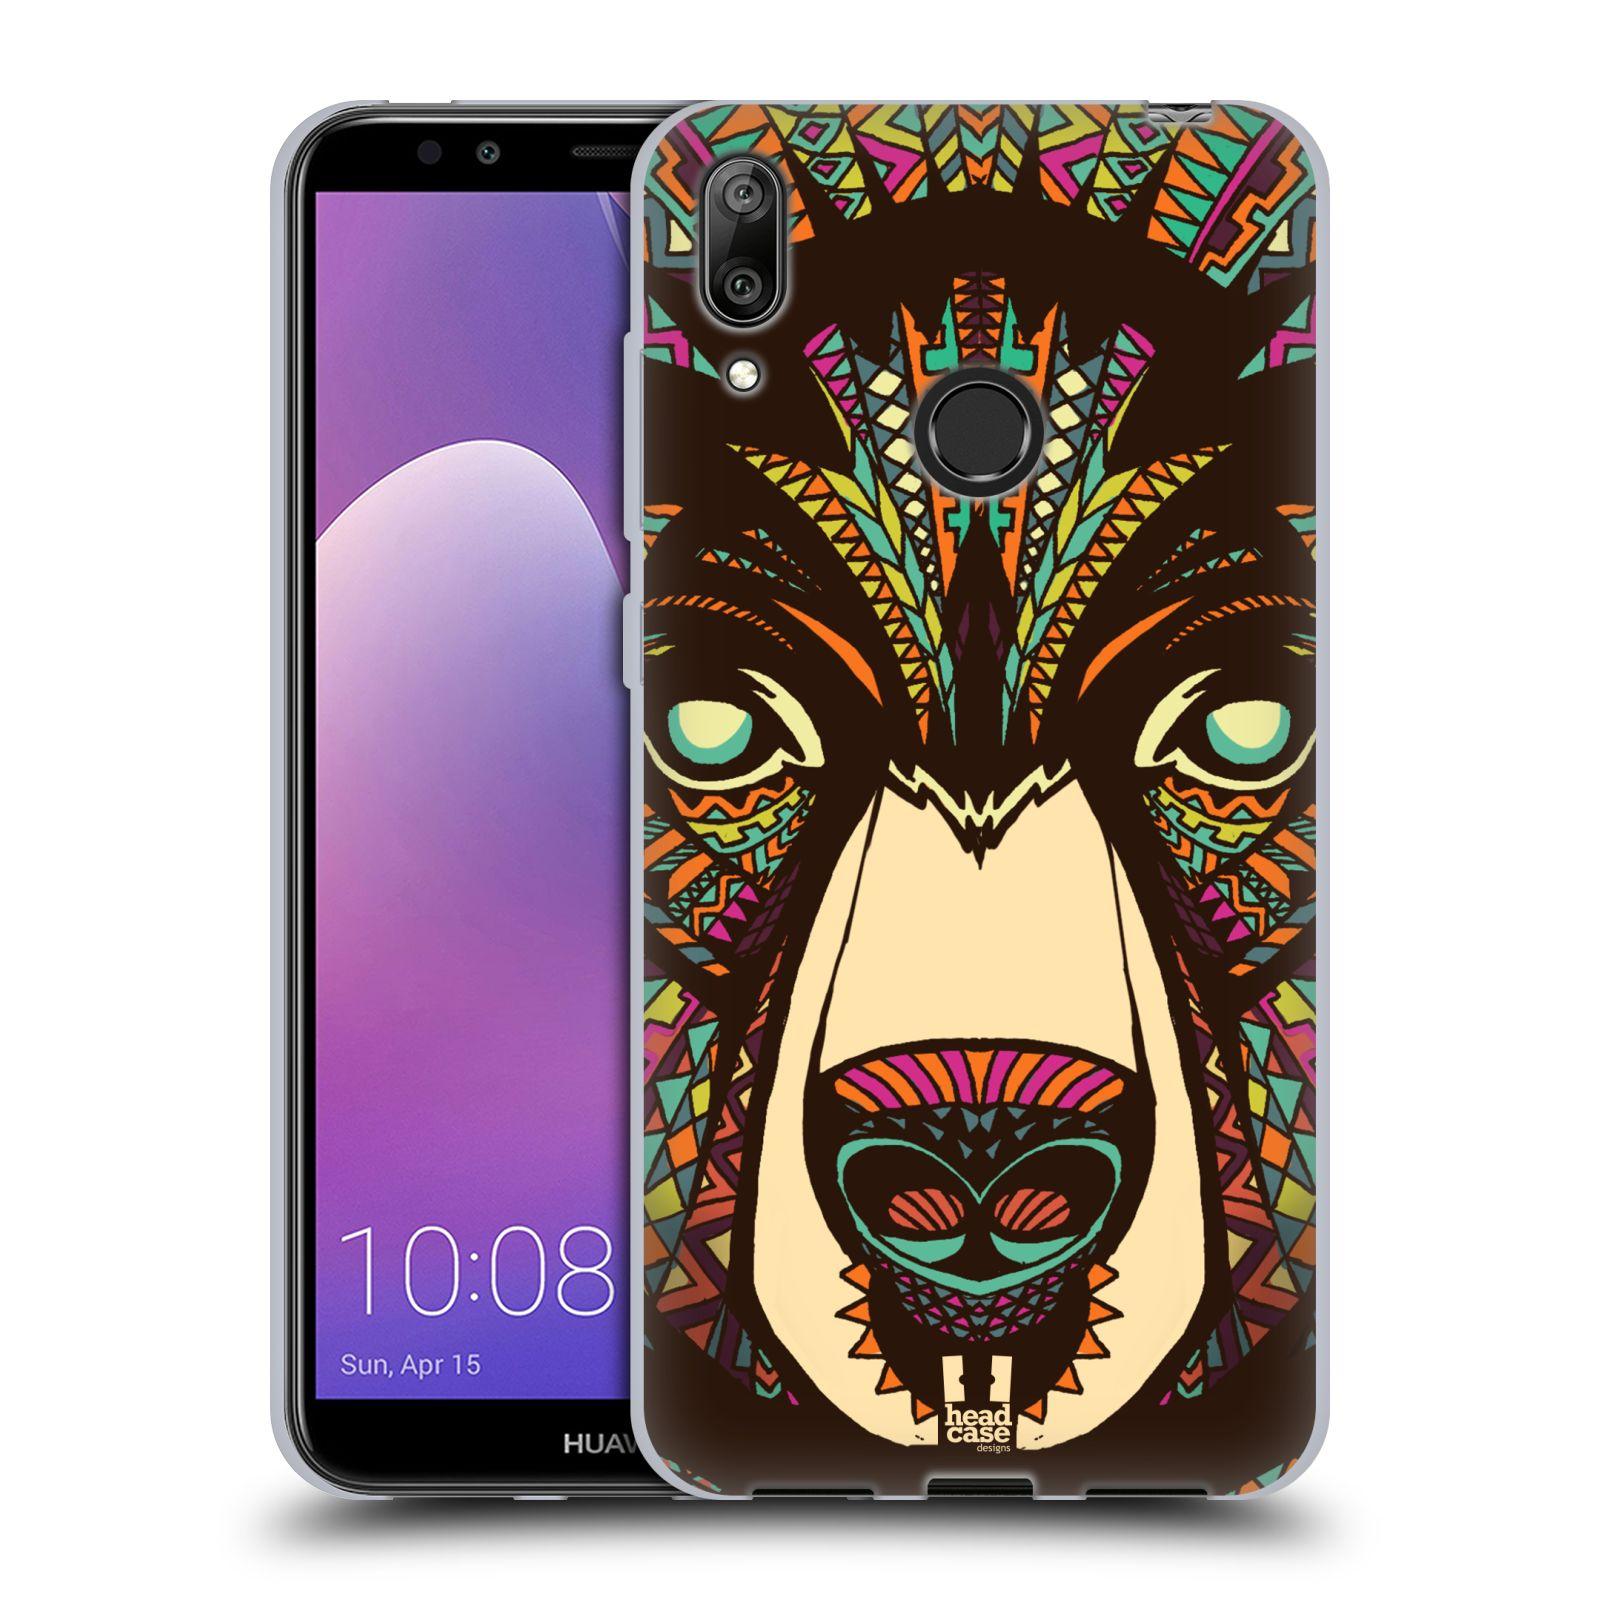 Silikonové pouzdro na mobil Huawei Y7 (2019) - Head Case - AZTEC MEDVĚD